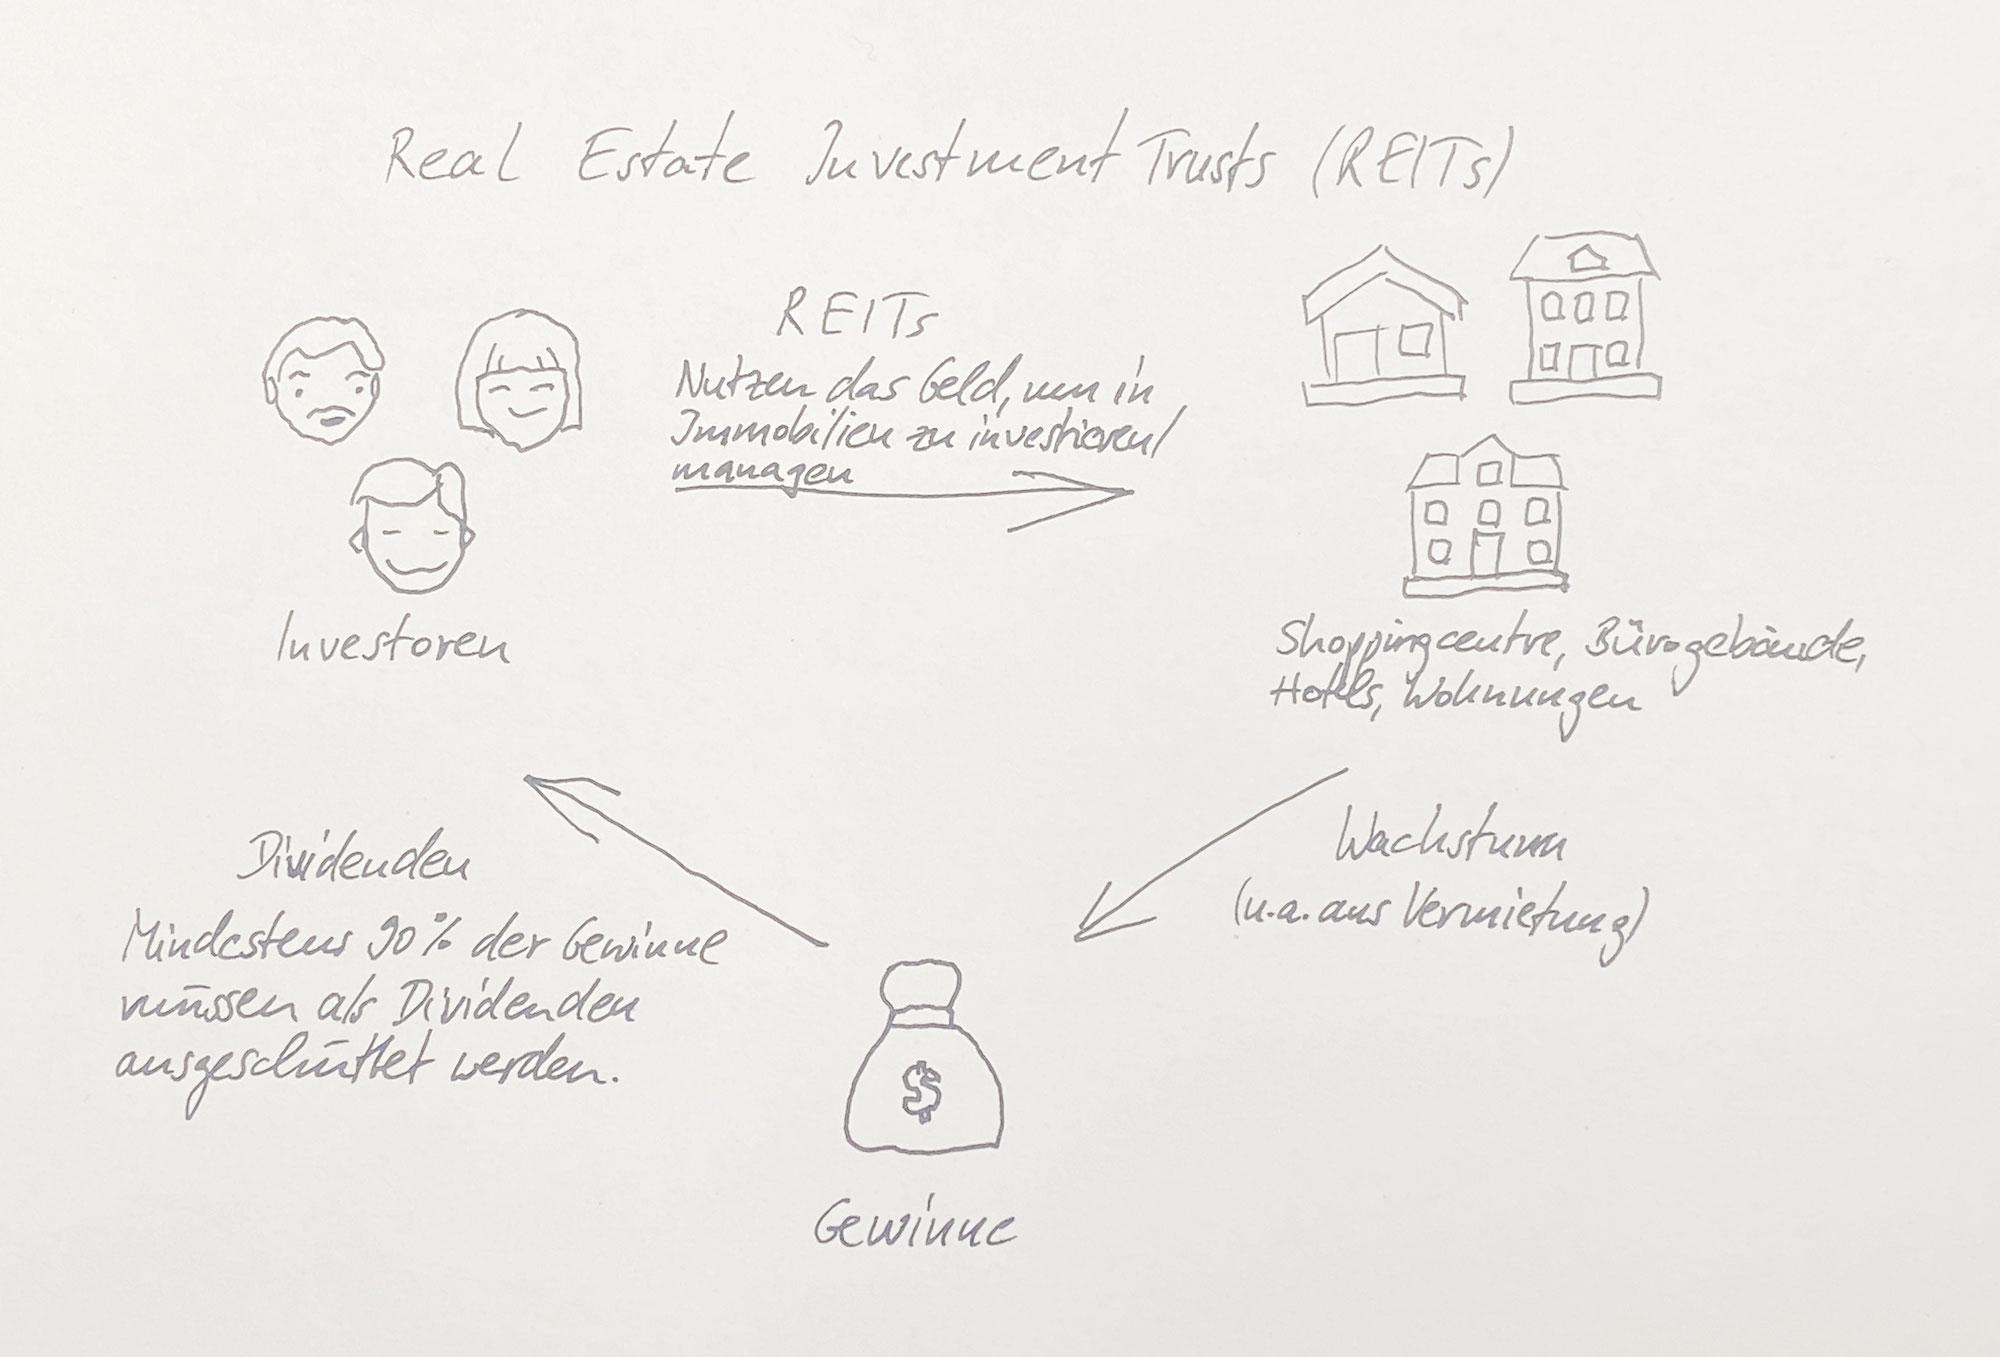 3. Meine ETF-Strategie: Real Estate Investment Trusts (REITs)